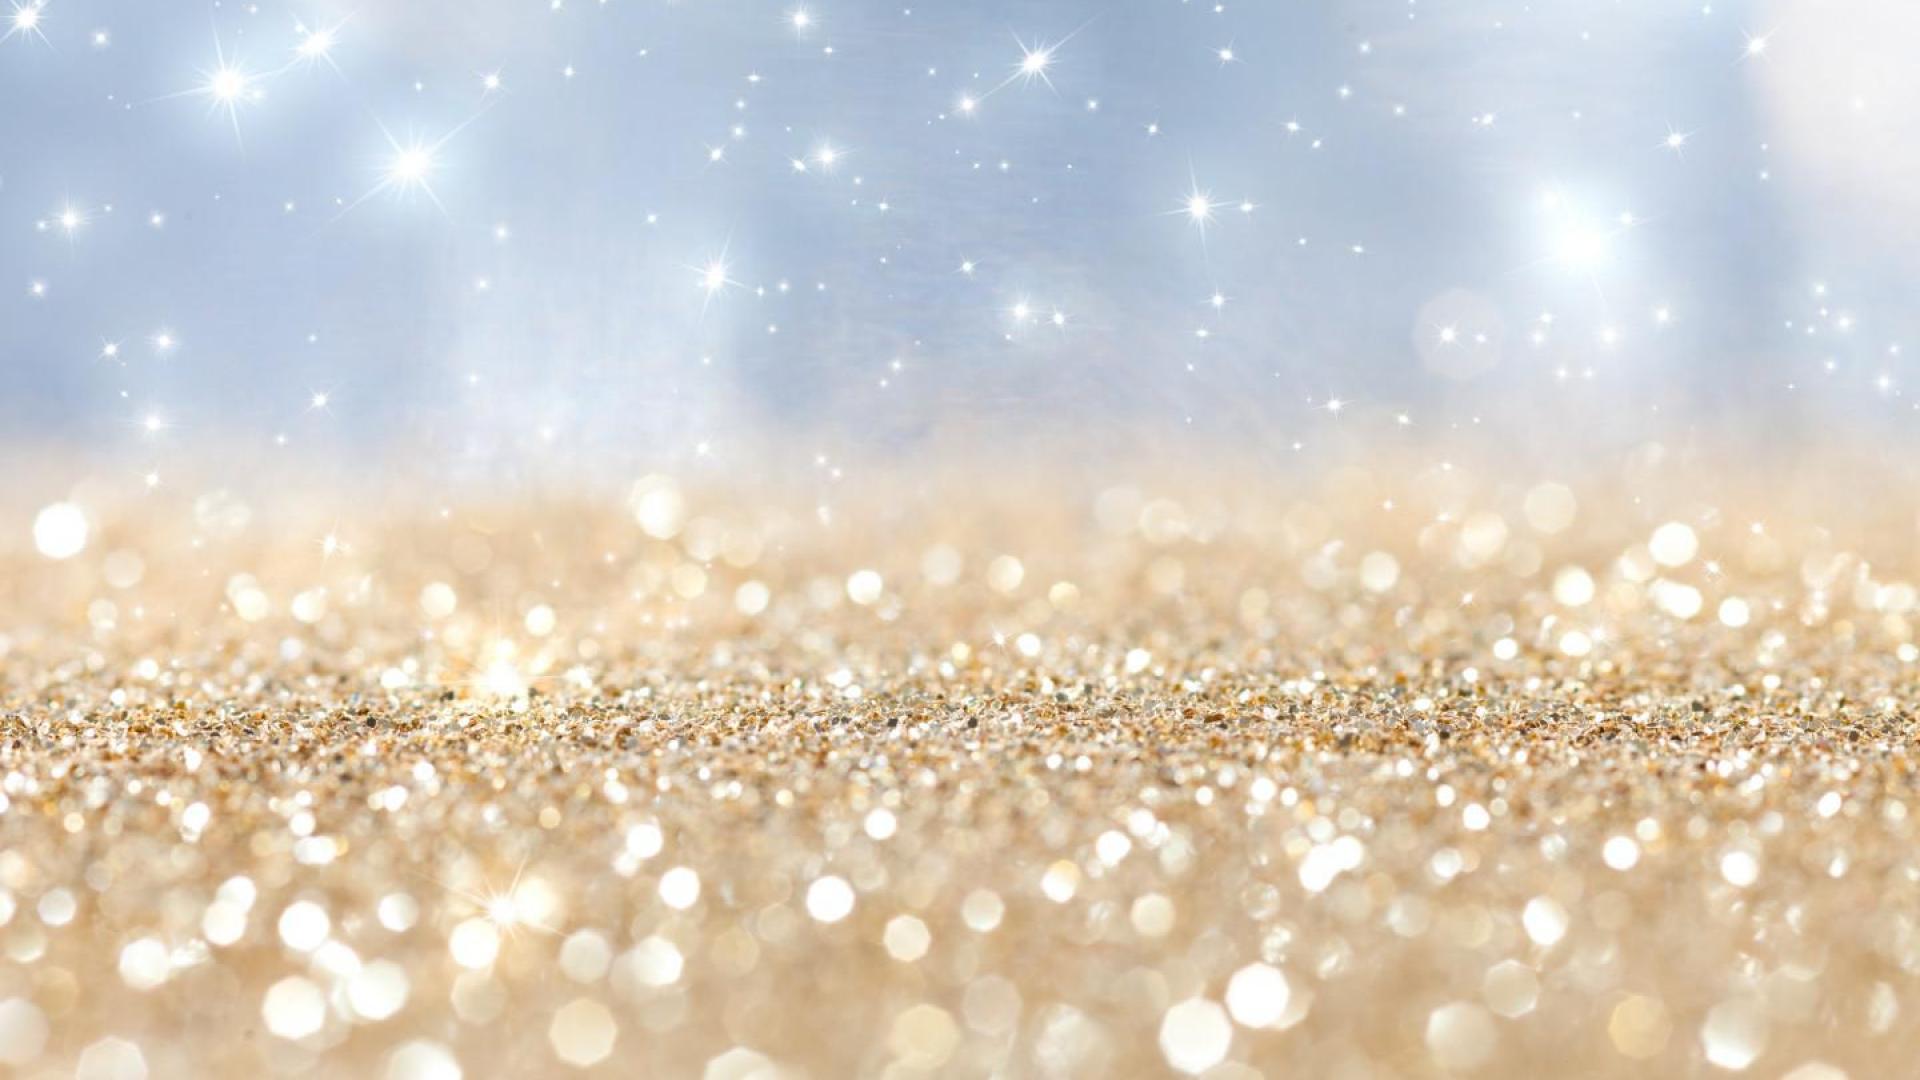 Glitter Fondo De Pantalla Hd Fondo De Escritorio